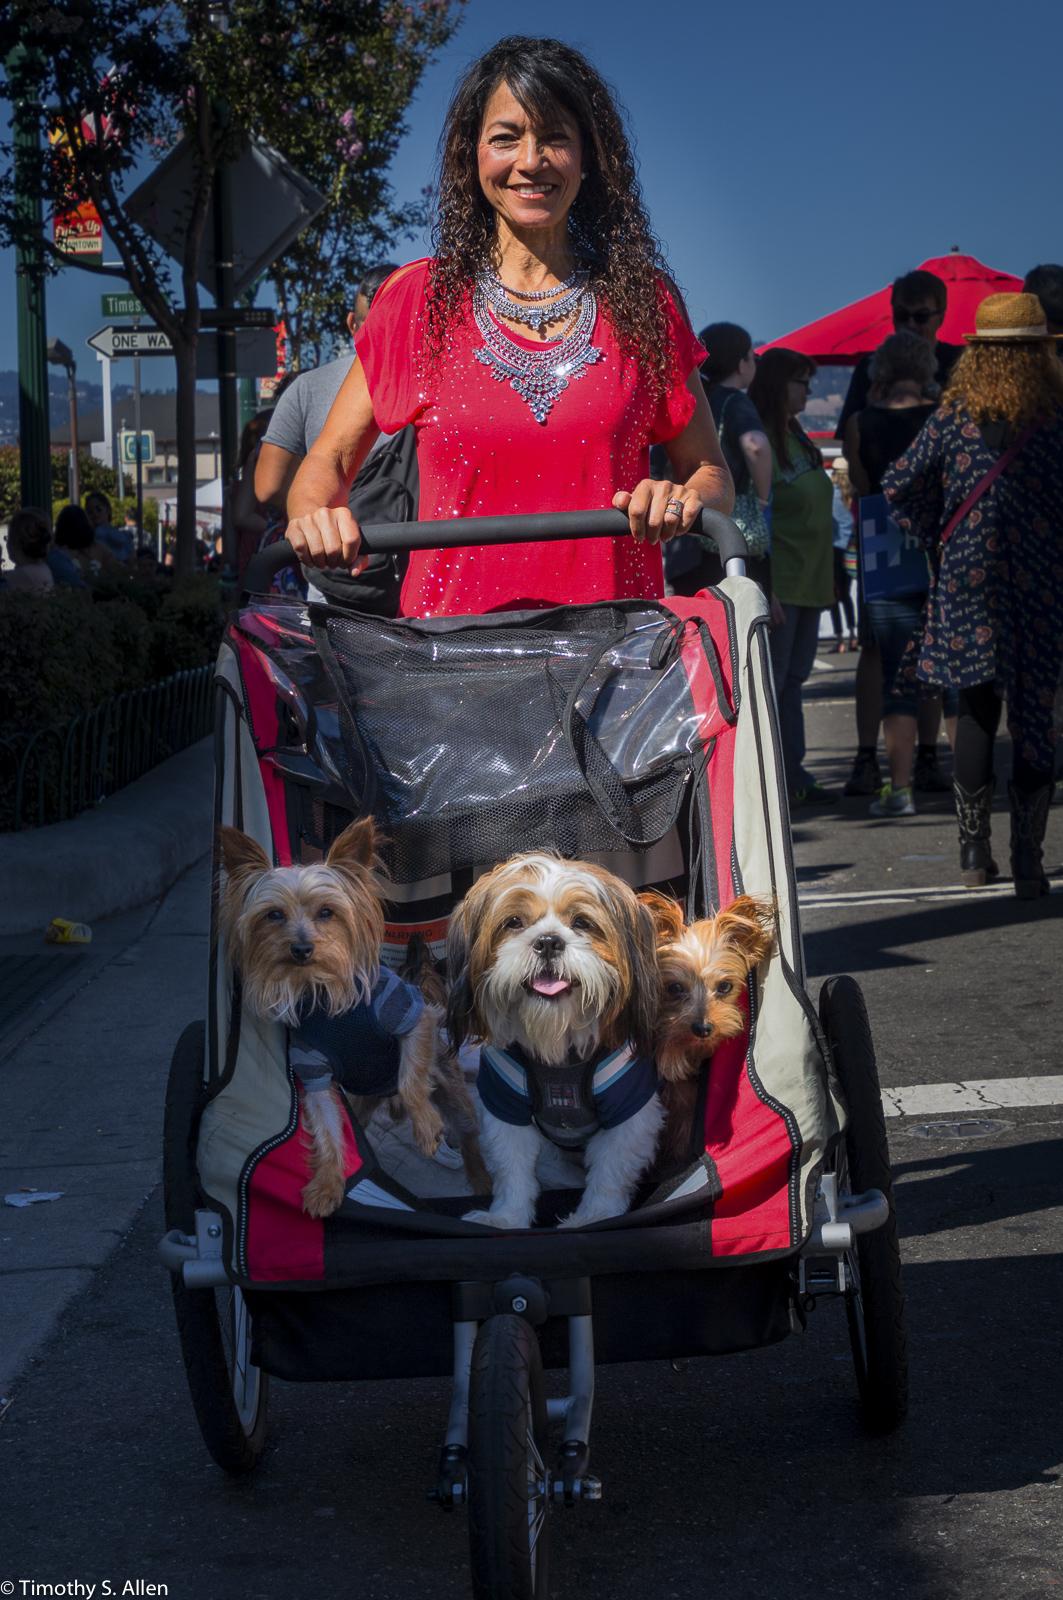 Alameda's Park Street Fair Alameda California, U.S.A. July 31, 2016